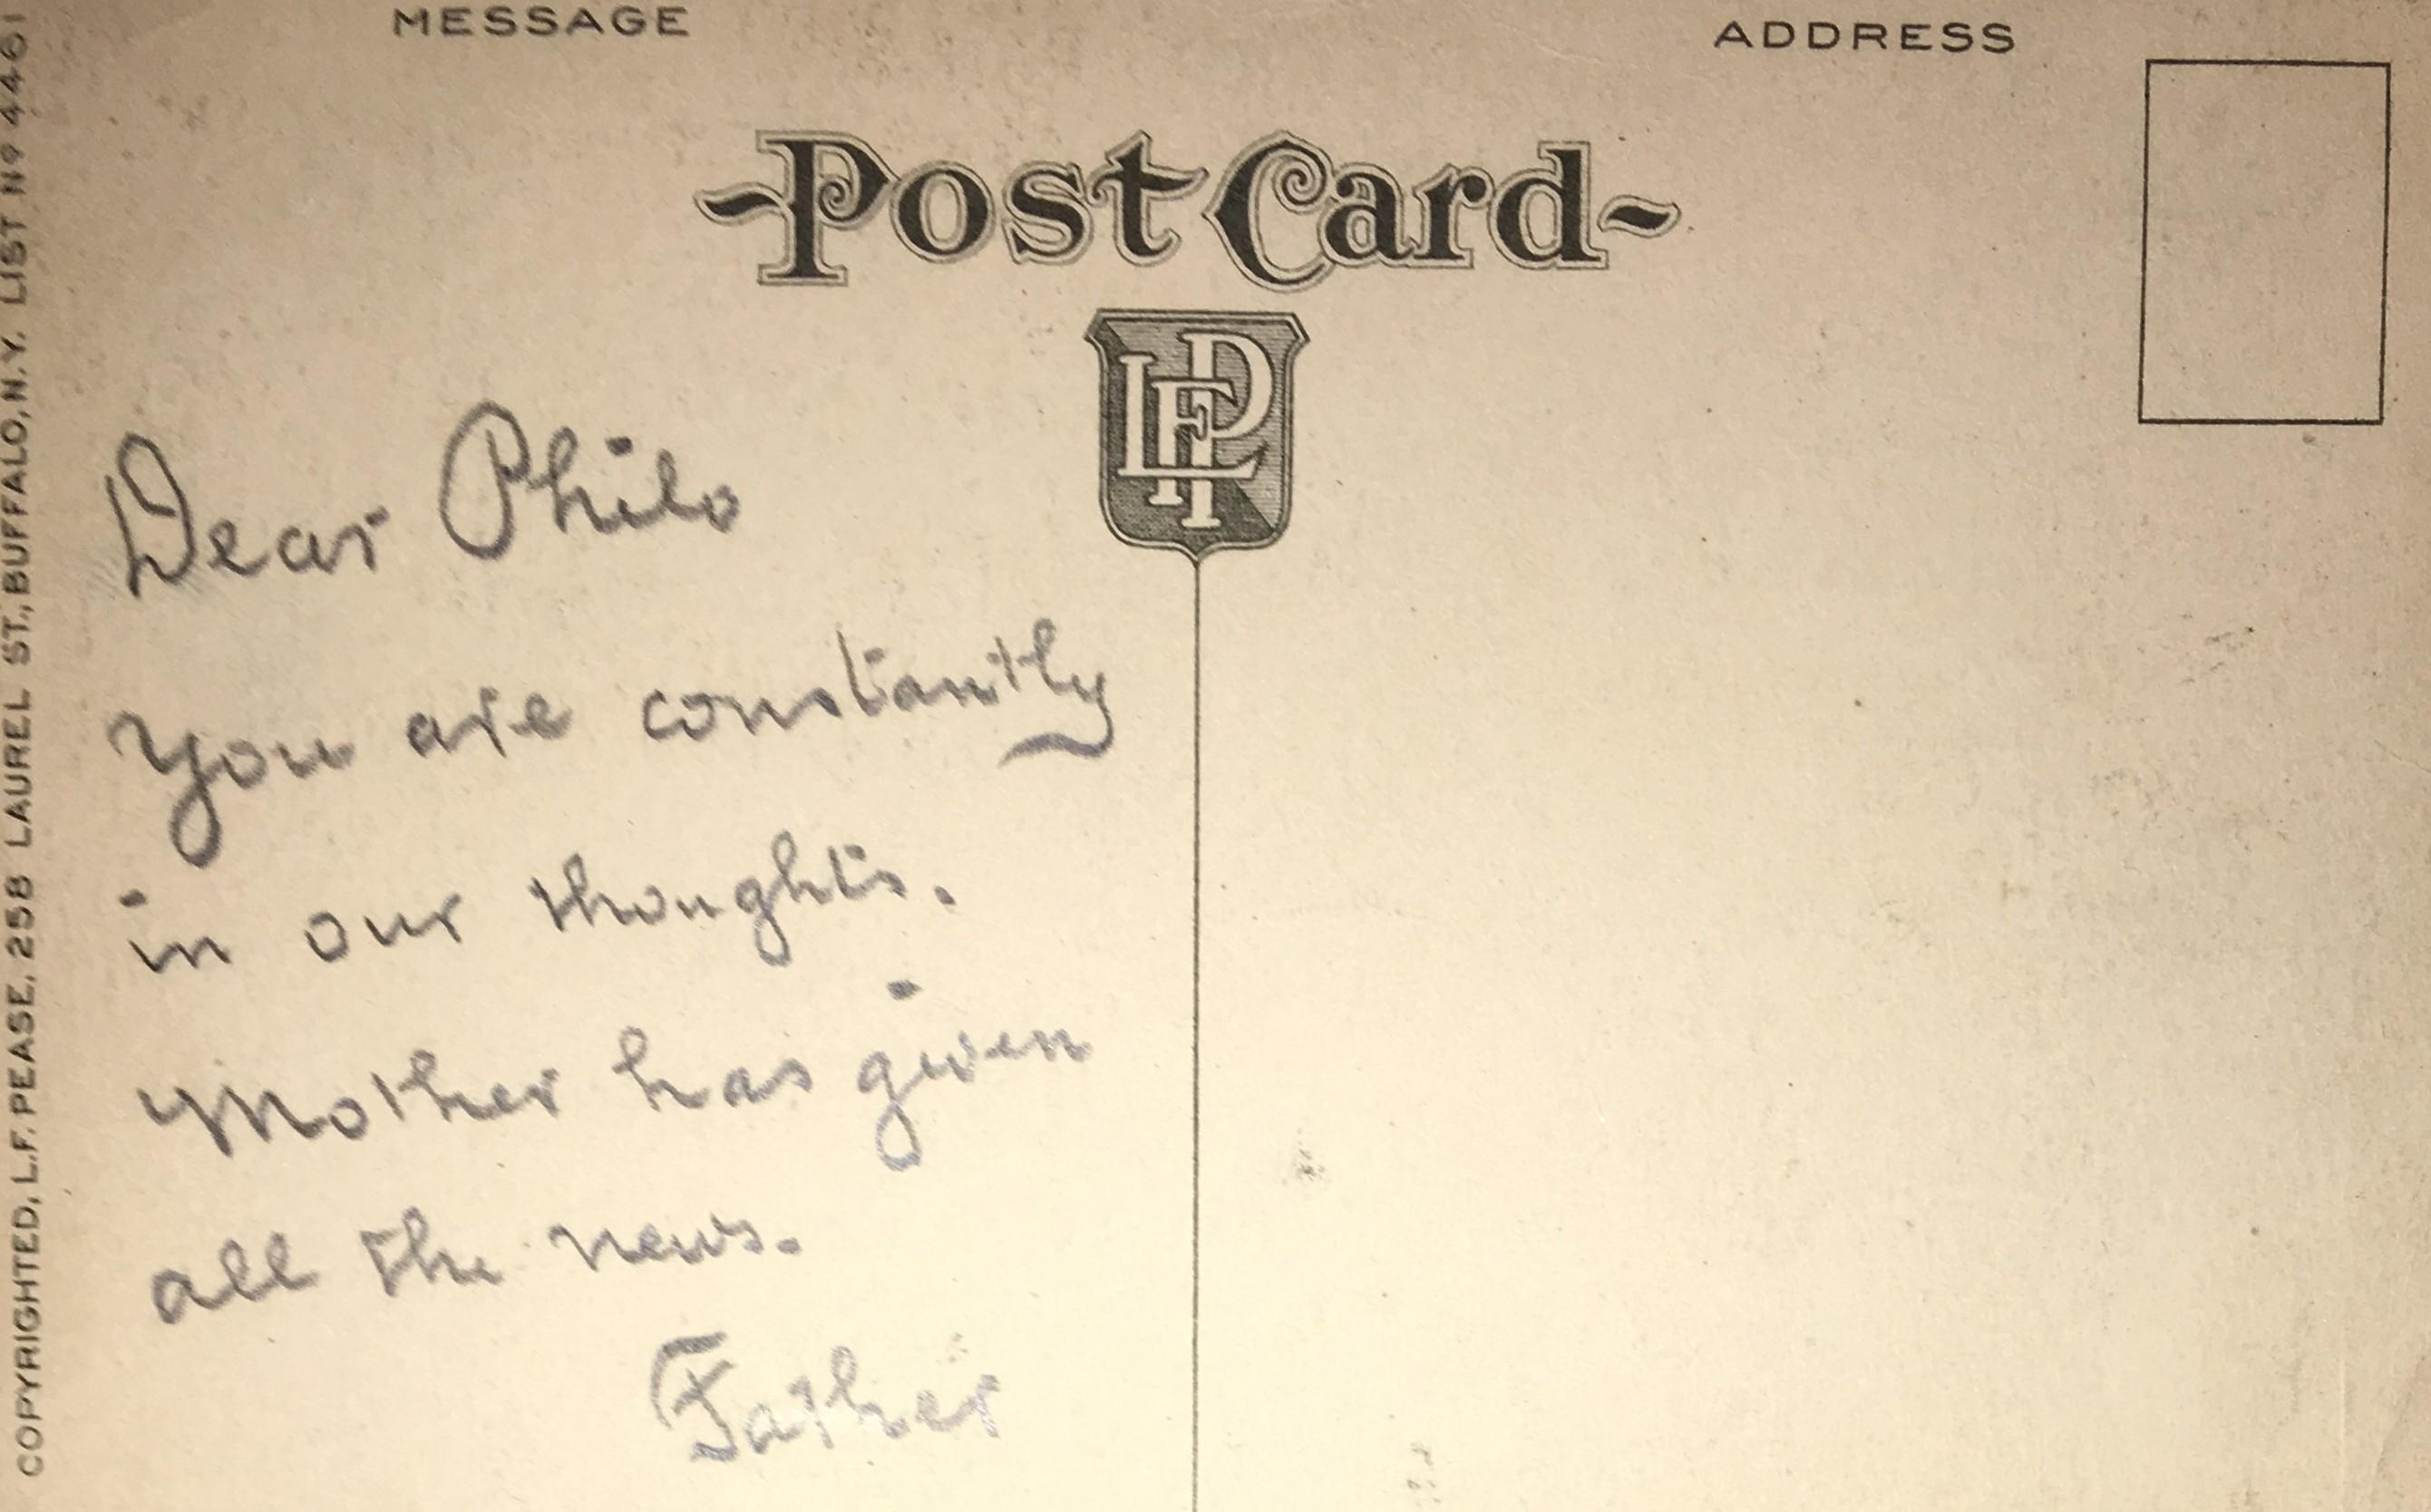 [Postcard rear] Dear Philo